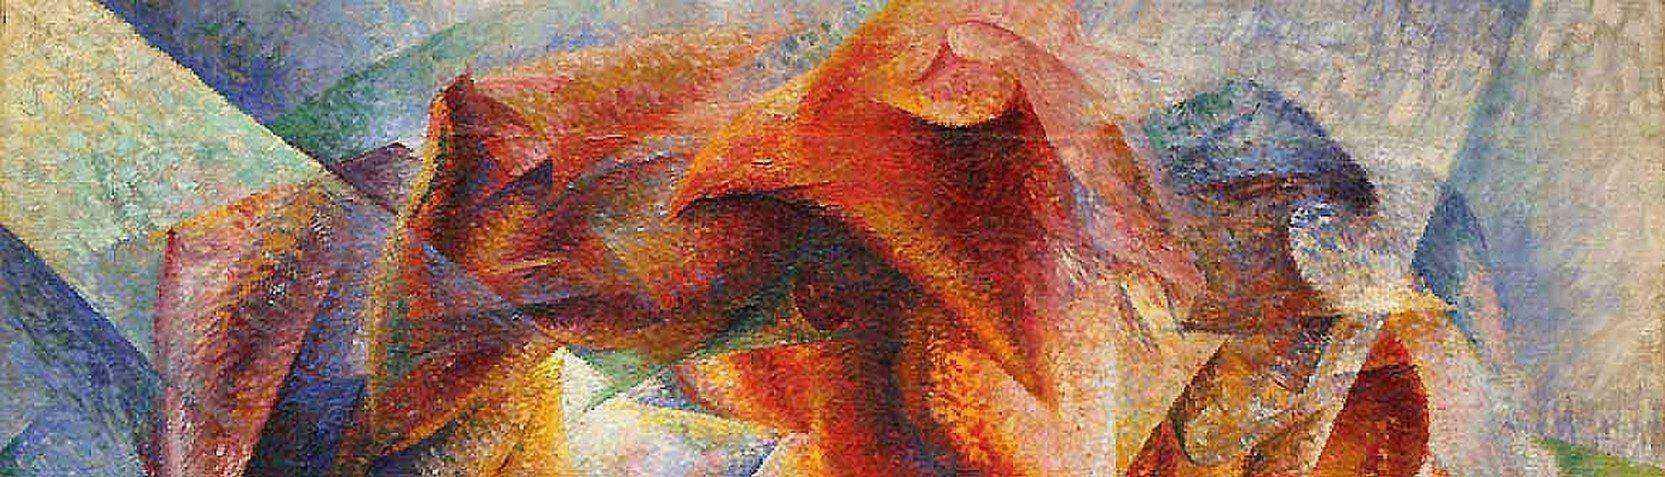 Artisti - Umberto Boccioni